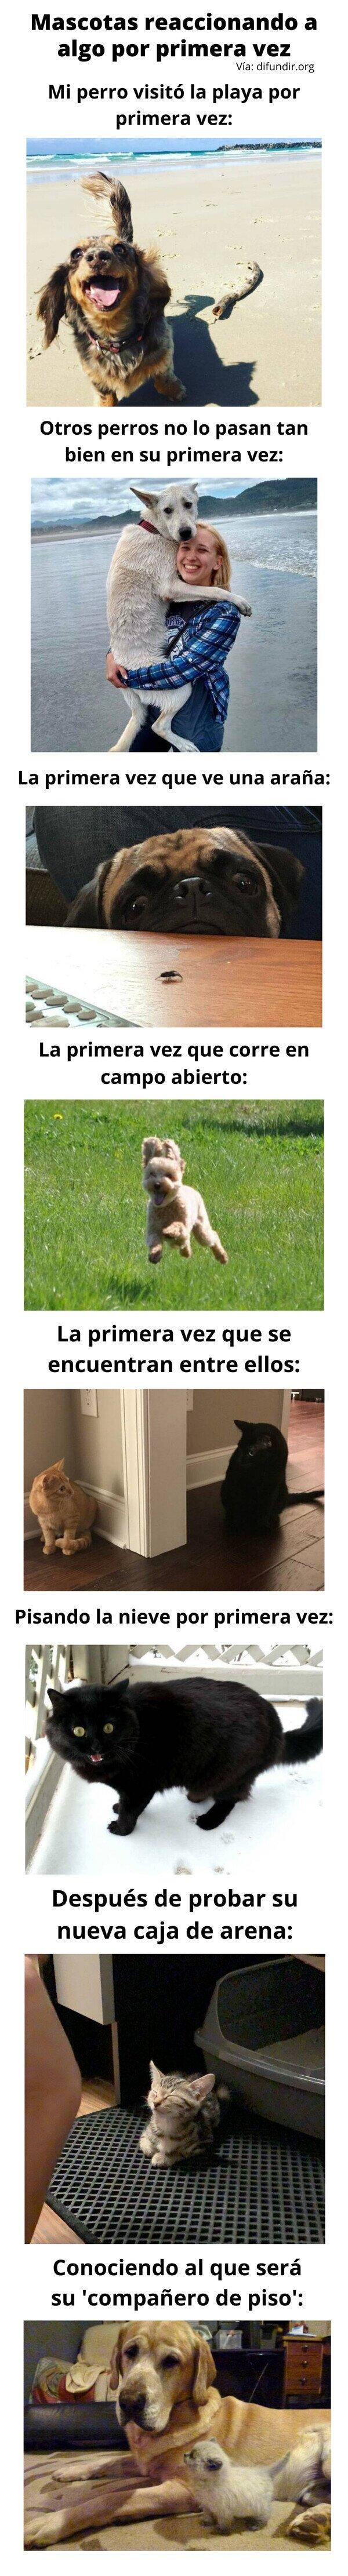 Meme_otros - Mascotas reaccionando a algo por primera vez